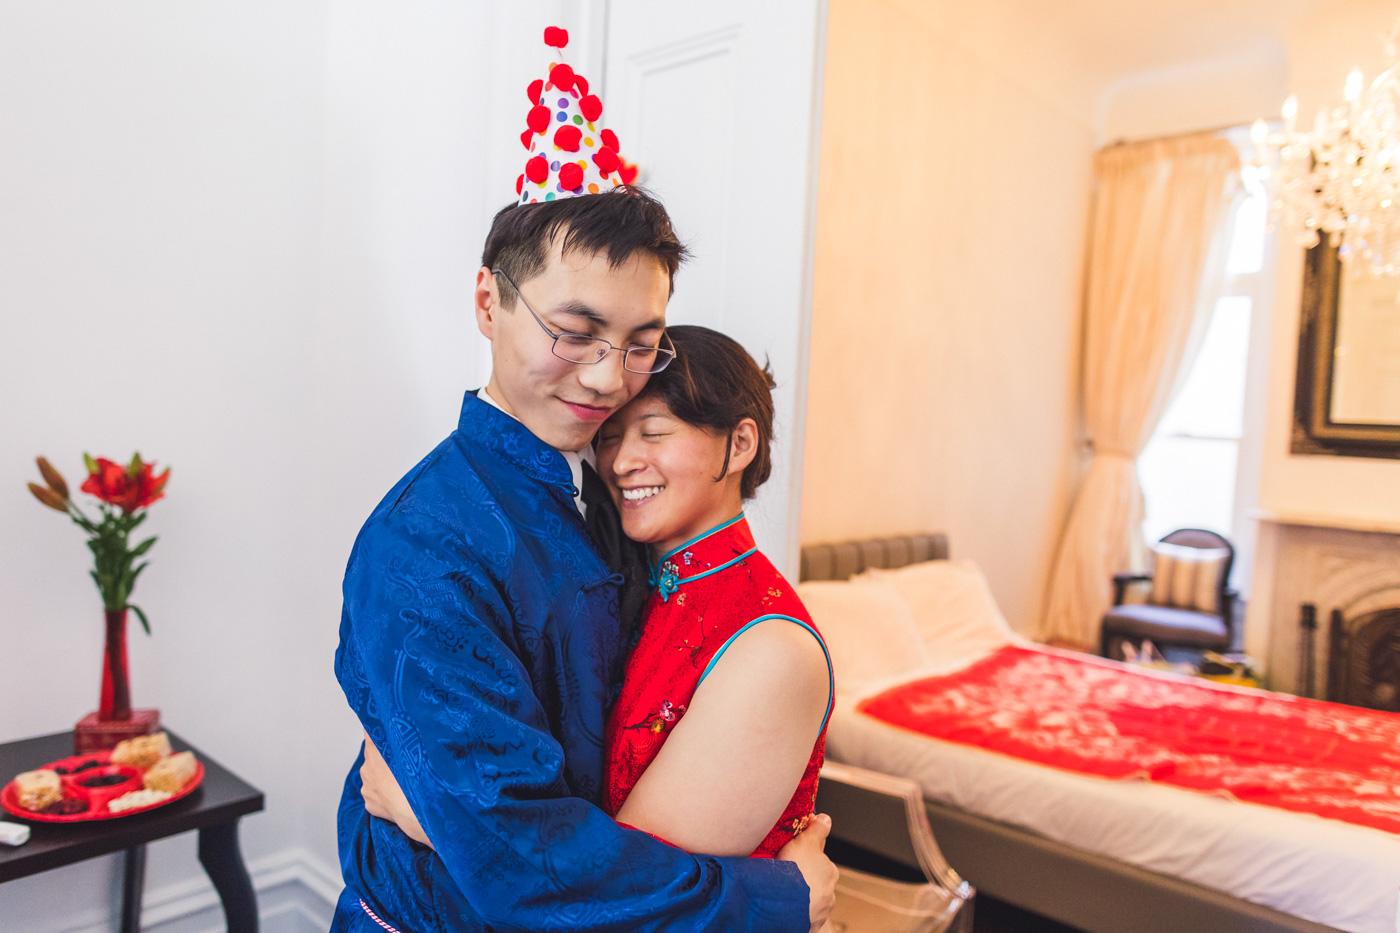 bride-revealed-at-tea-ceremony